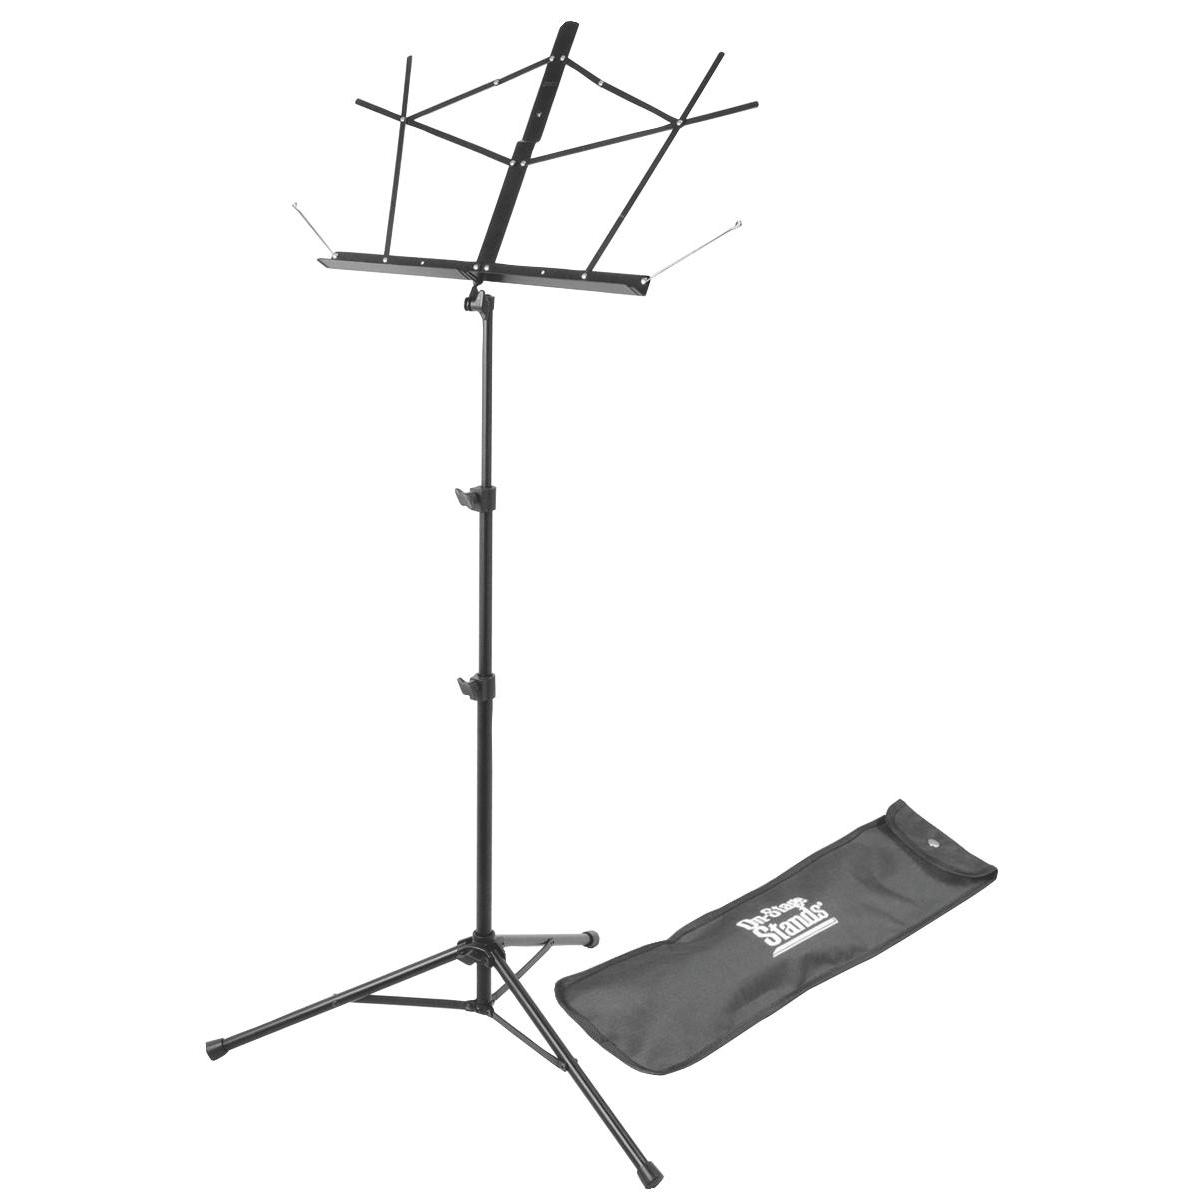 On Stage Tripod Base Sheet Music Stand (Black w/ Bag)